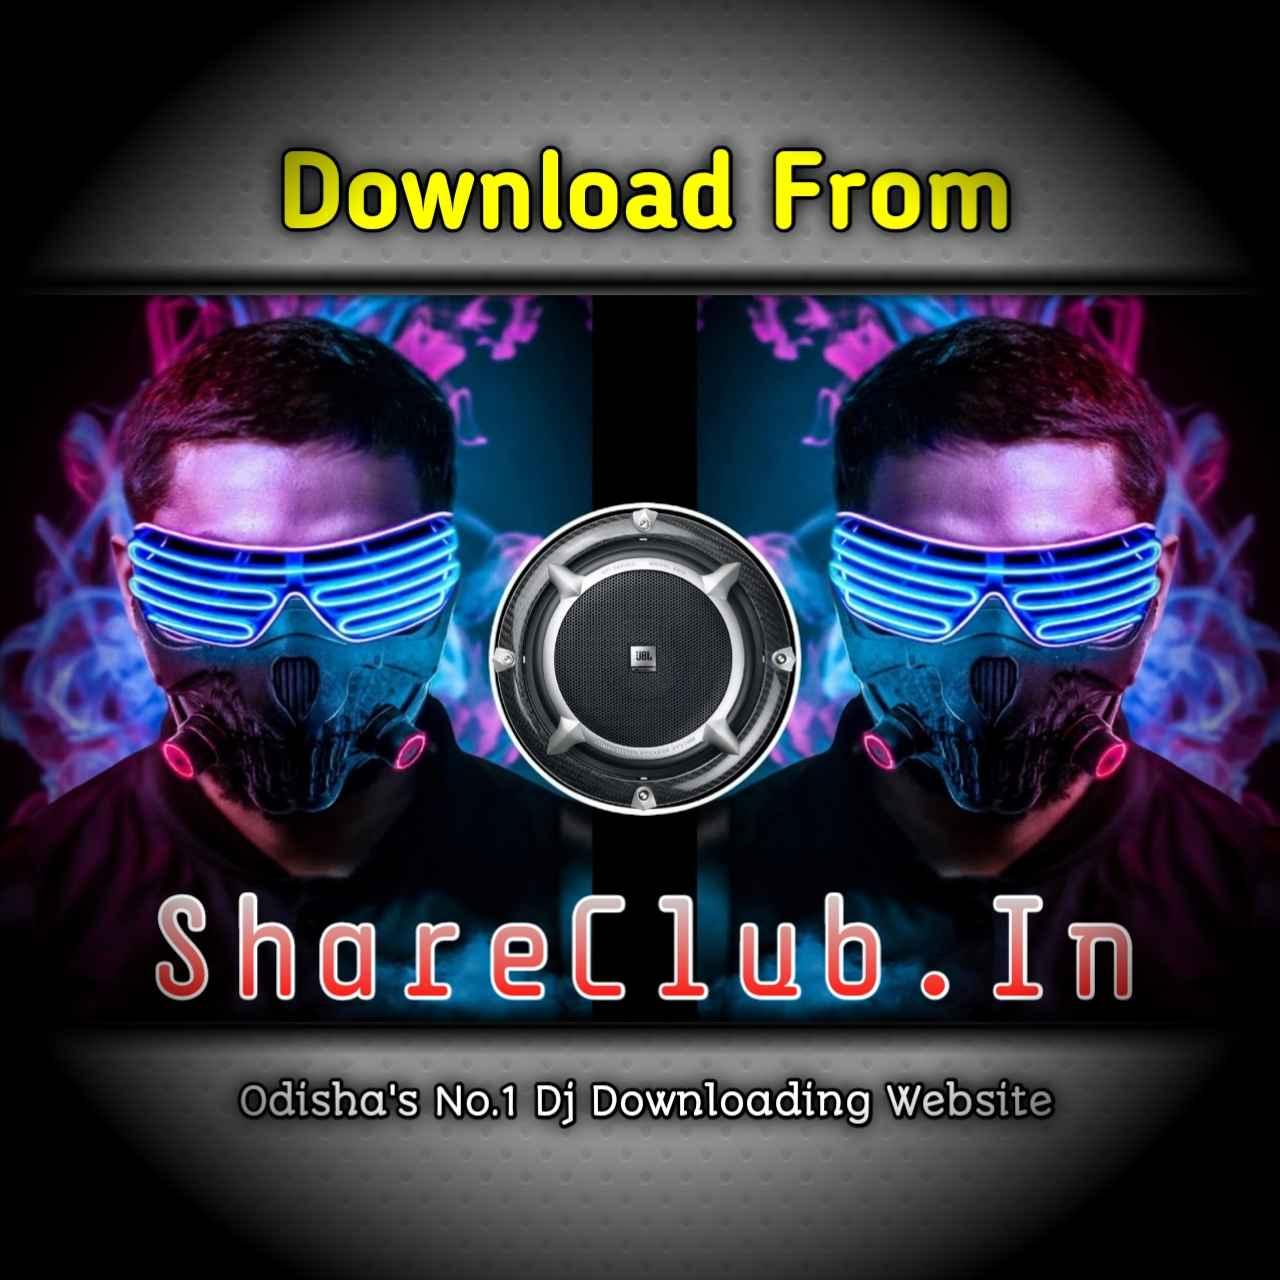 RAIGARH RAJA (TRAP HARD STYLE CG) A1 MUSIC COMPANY